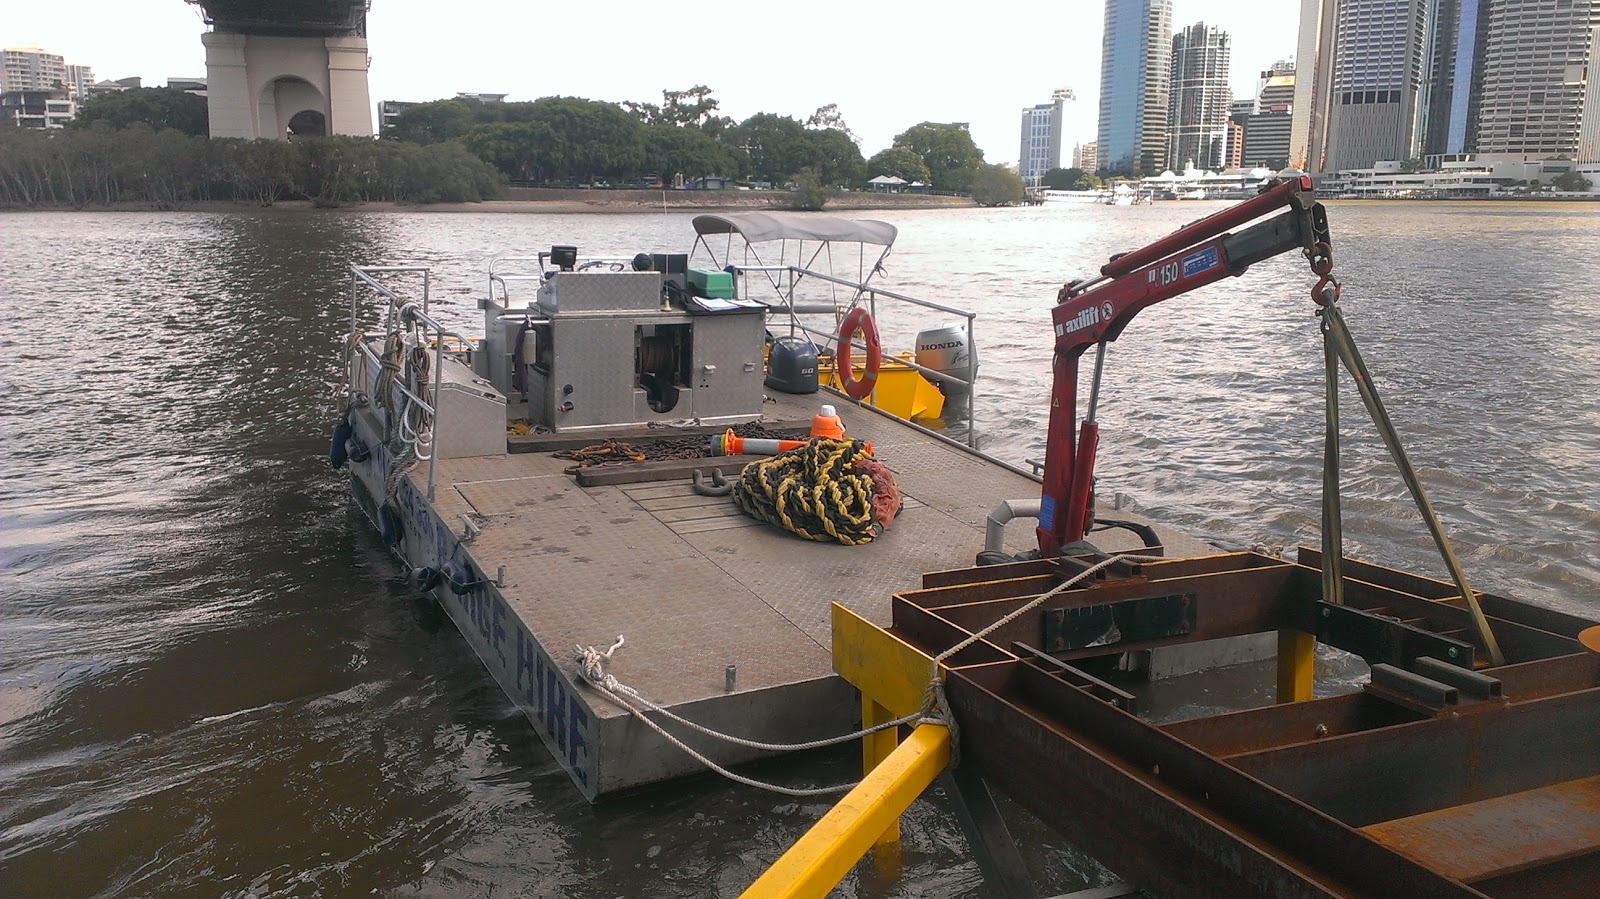 work barge hire, hire work punt, flat deck barge, barge hire